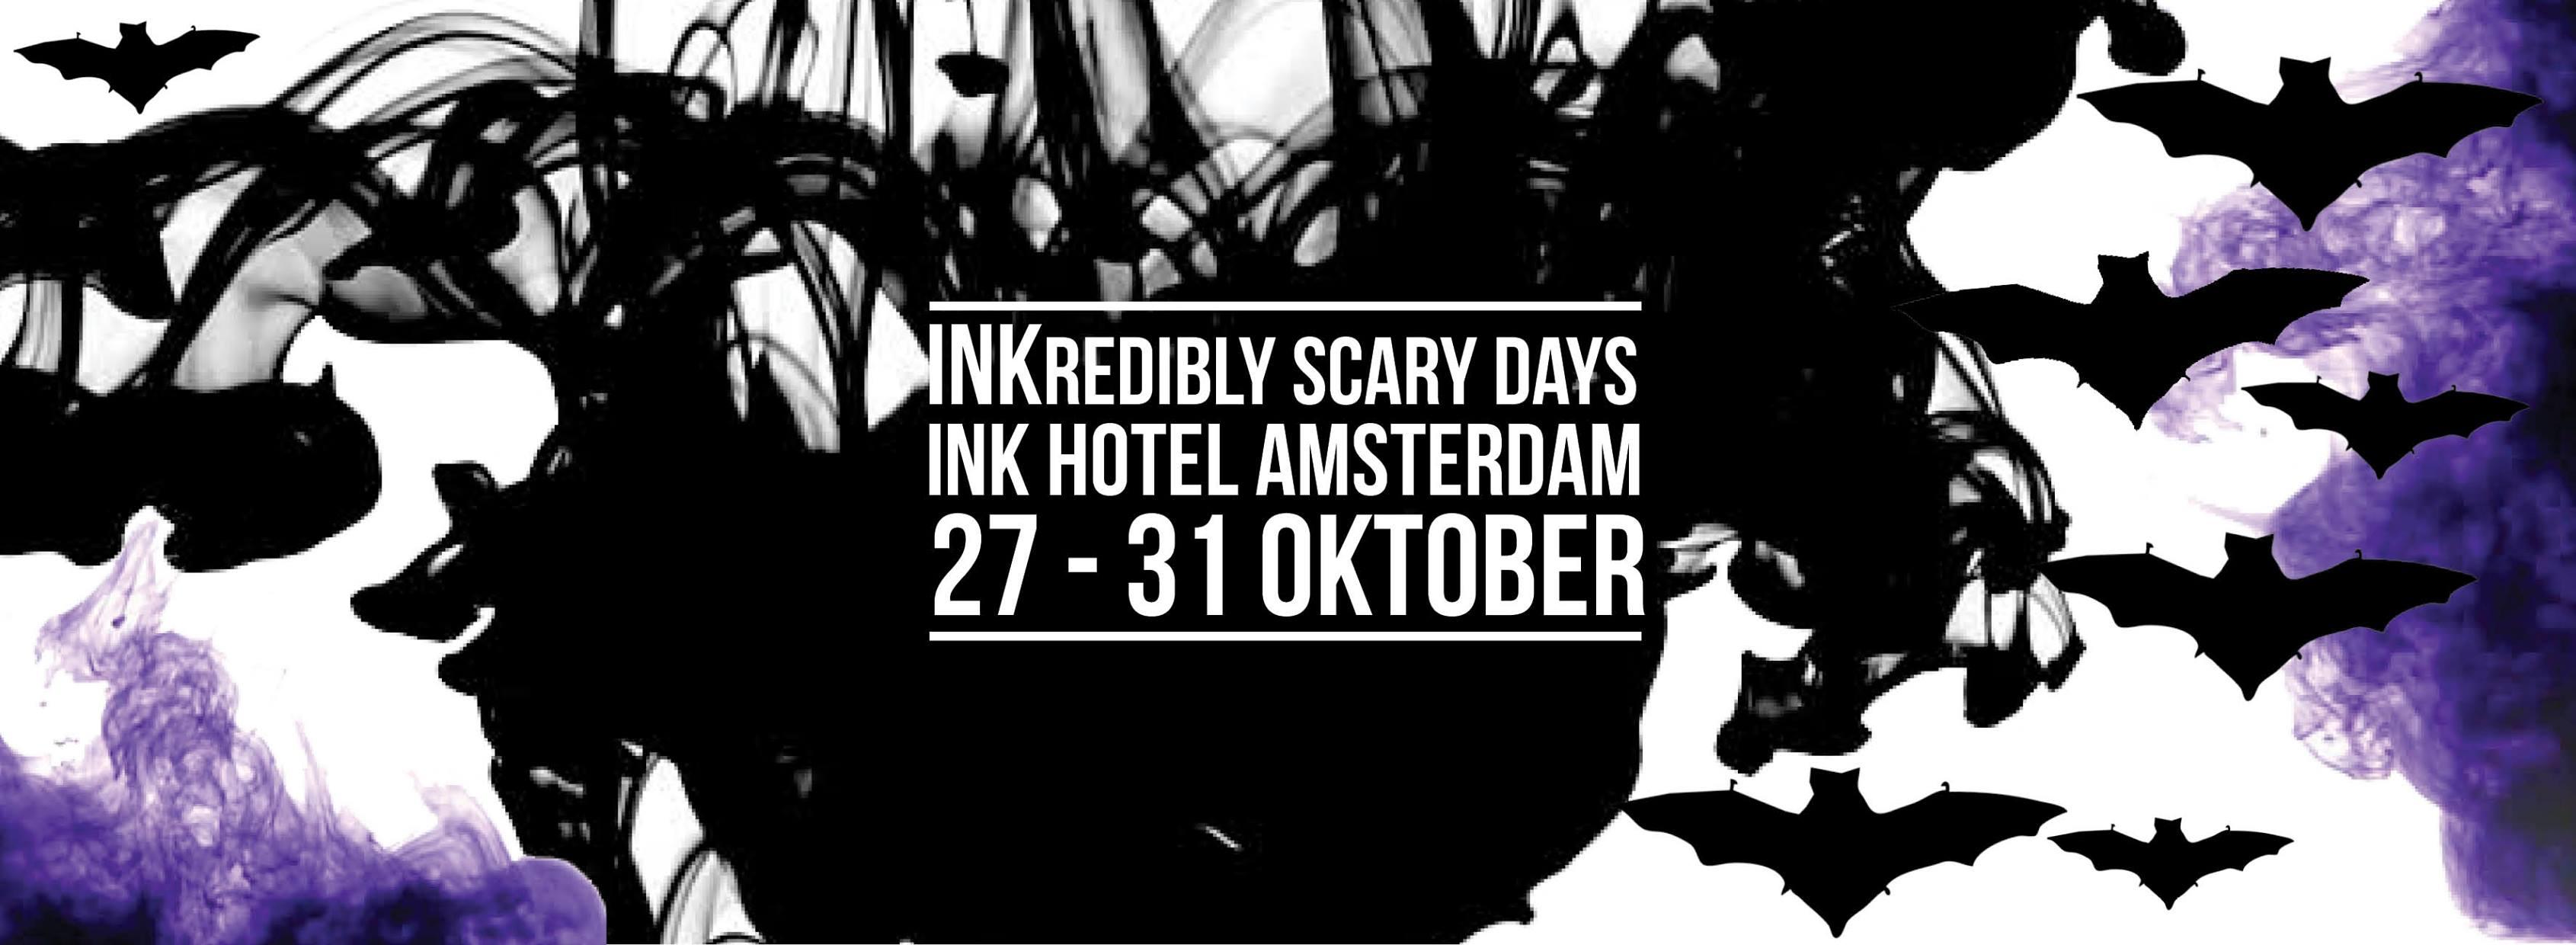 Halloween-spots-Amsterdam-meisjes-verkleerd-eng-MAN-MA